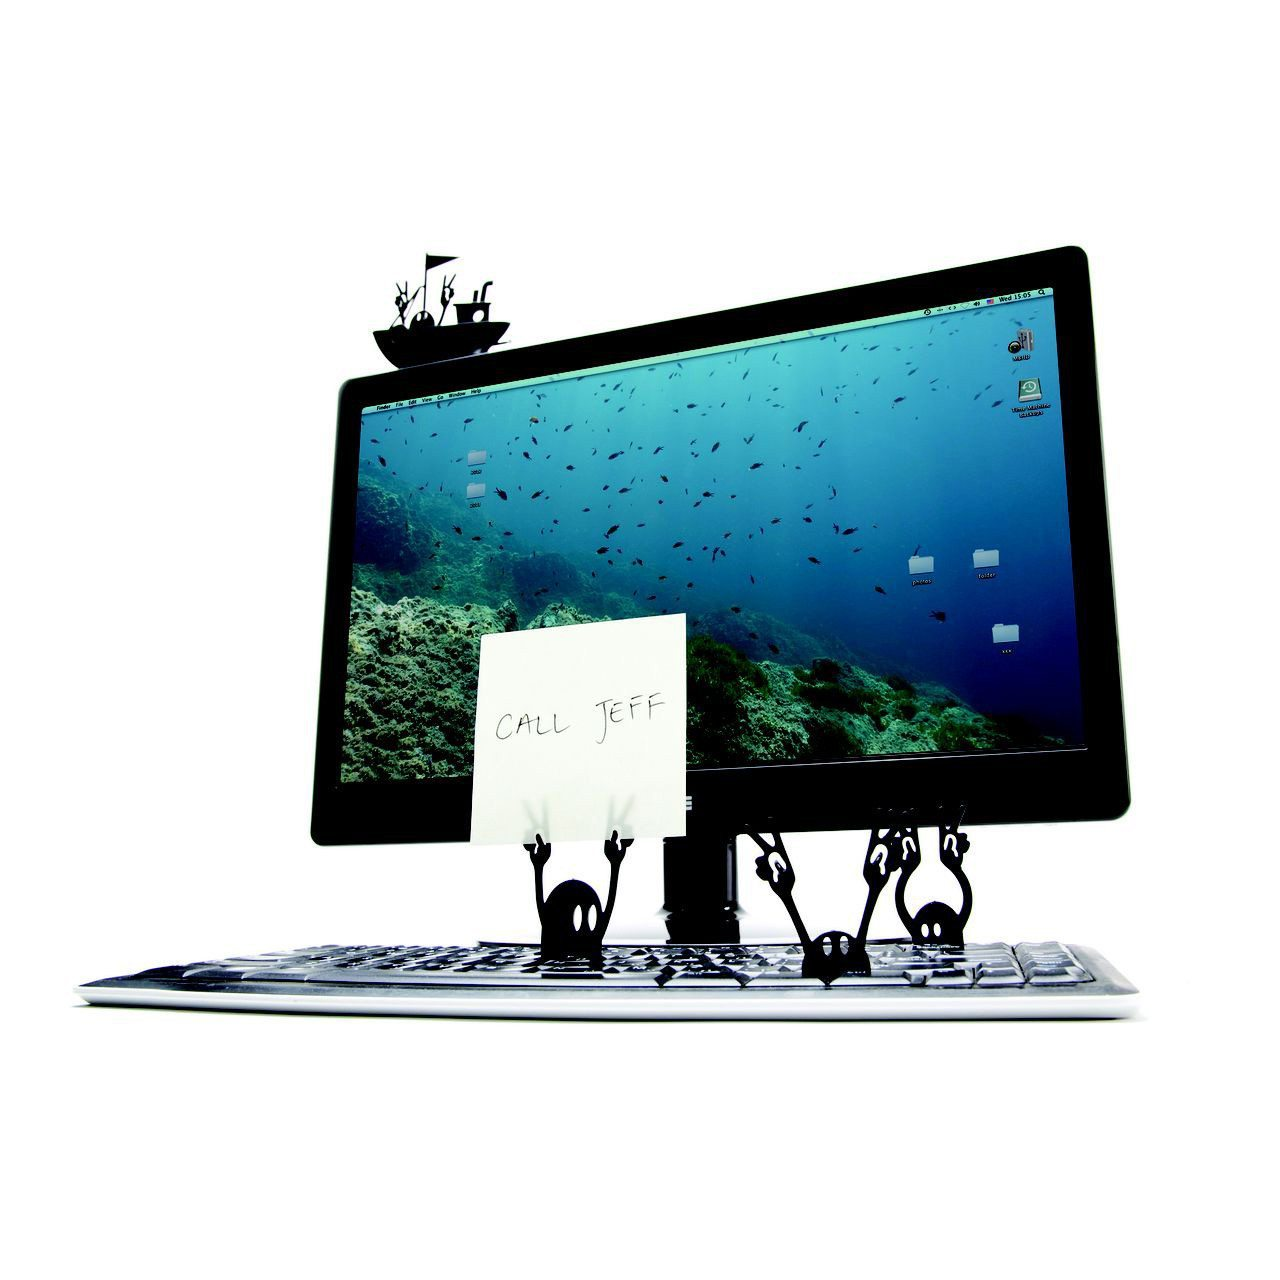 Tastatur Piraten